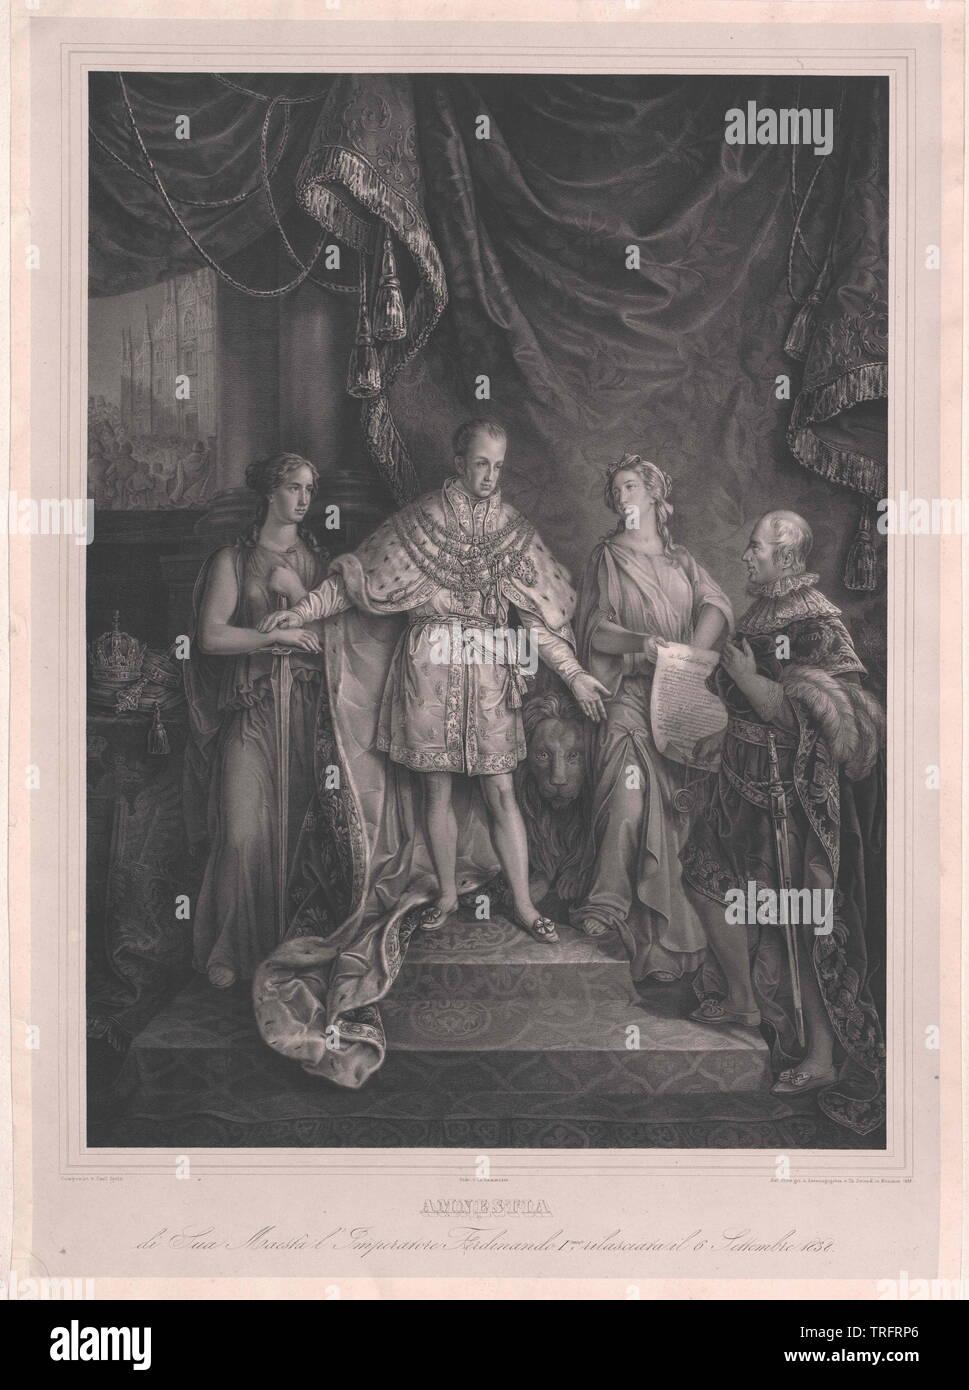 Ferdinand I, Emperador de Austria, Additional-Rights-Clearance-Info-Not-Available Foto de stock